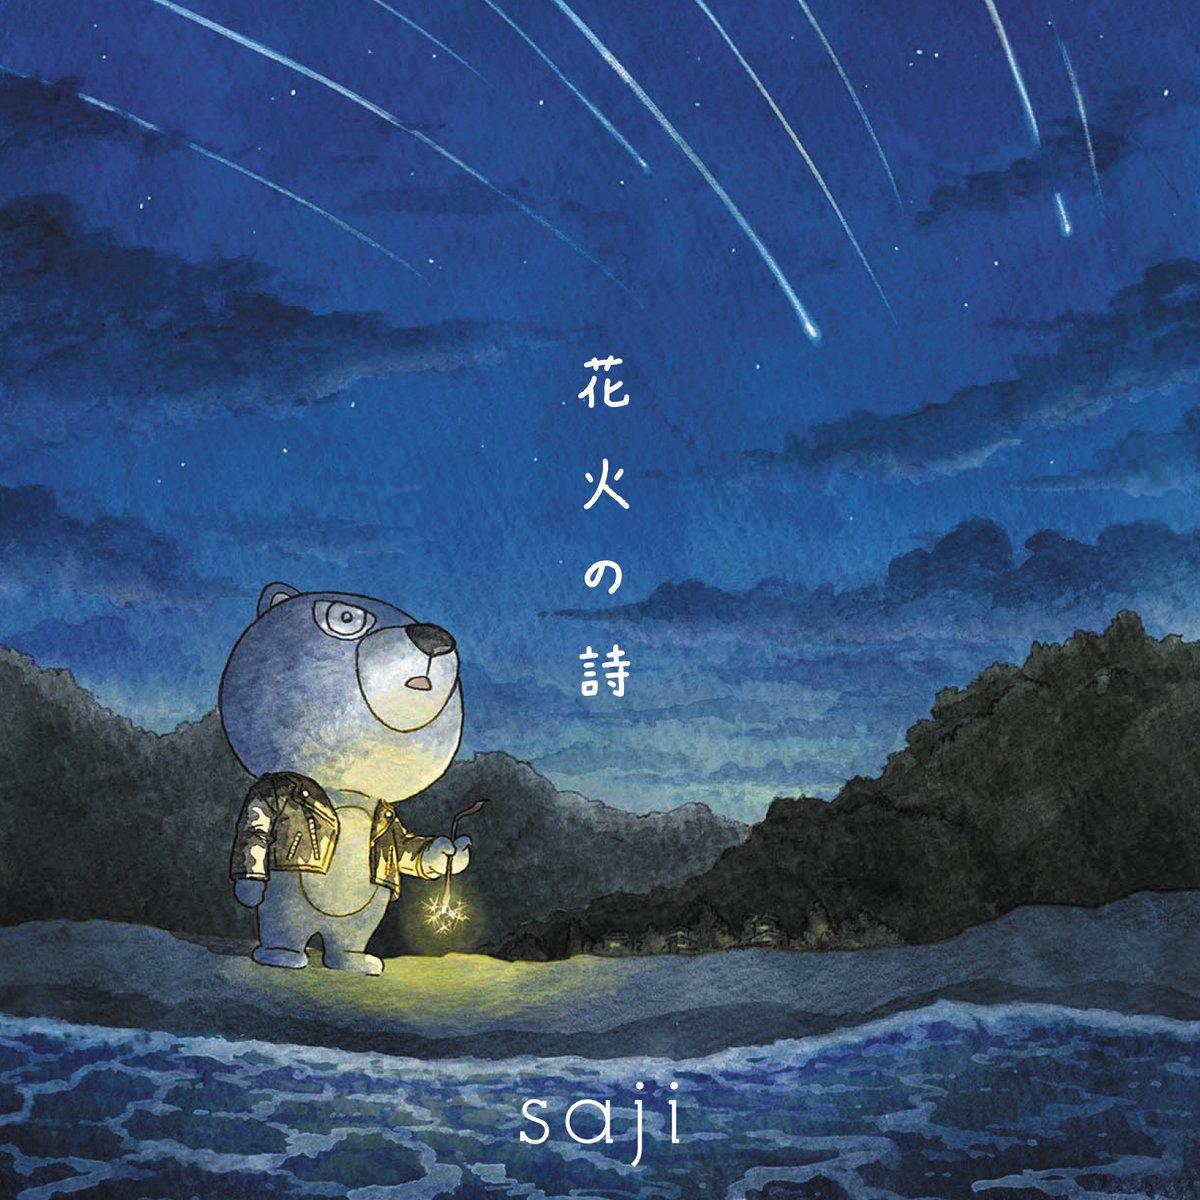 saji - 花火の詩 [2020.09.23+MP3+RAR]